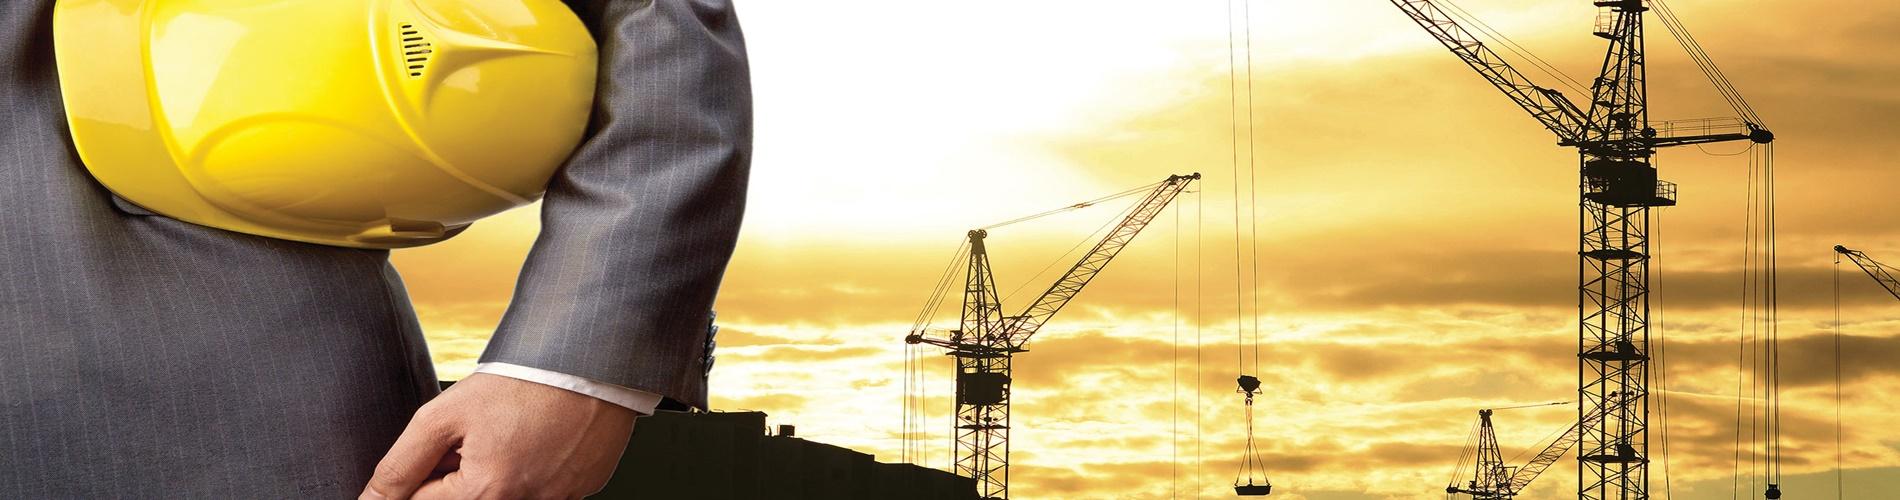 banner-1-Construction